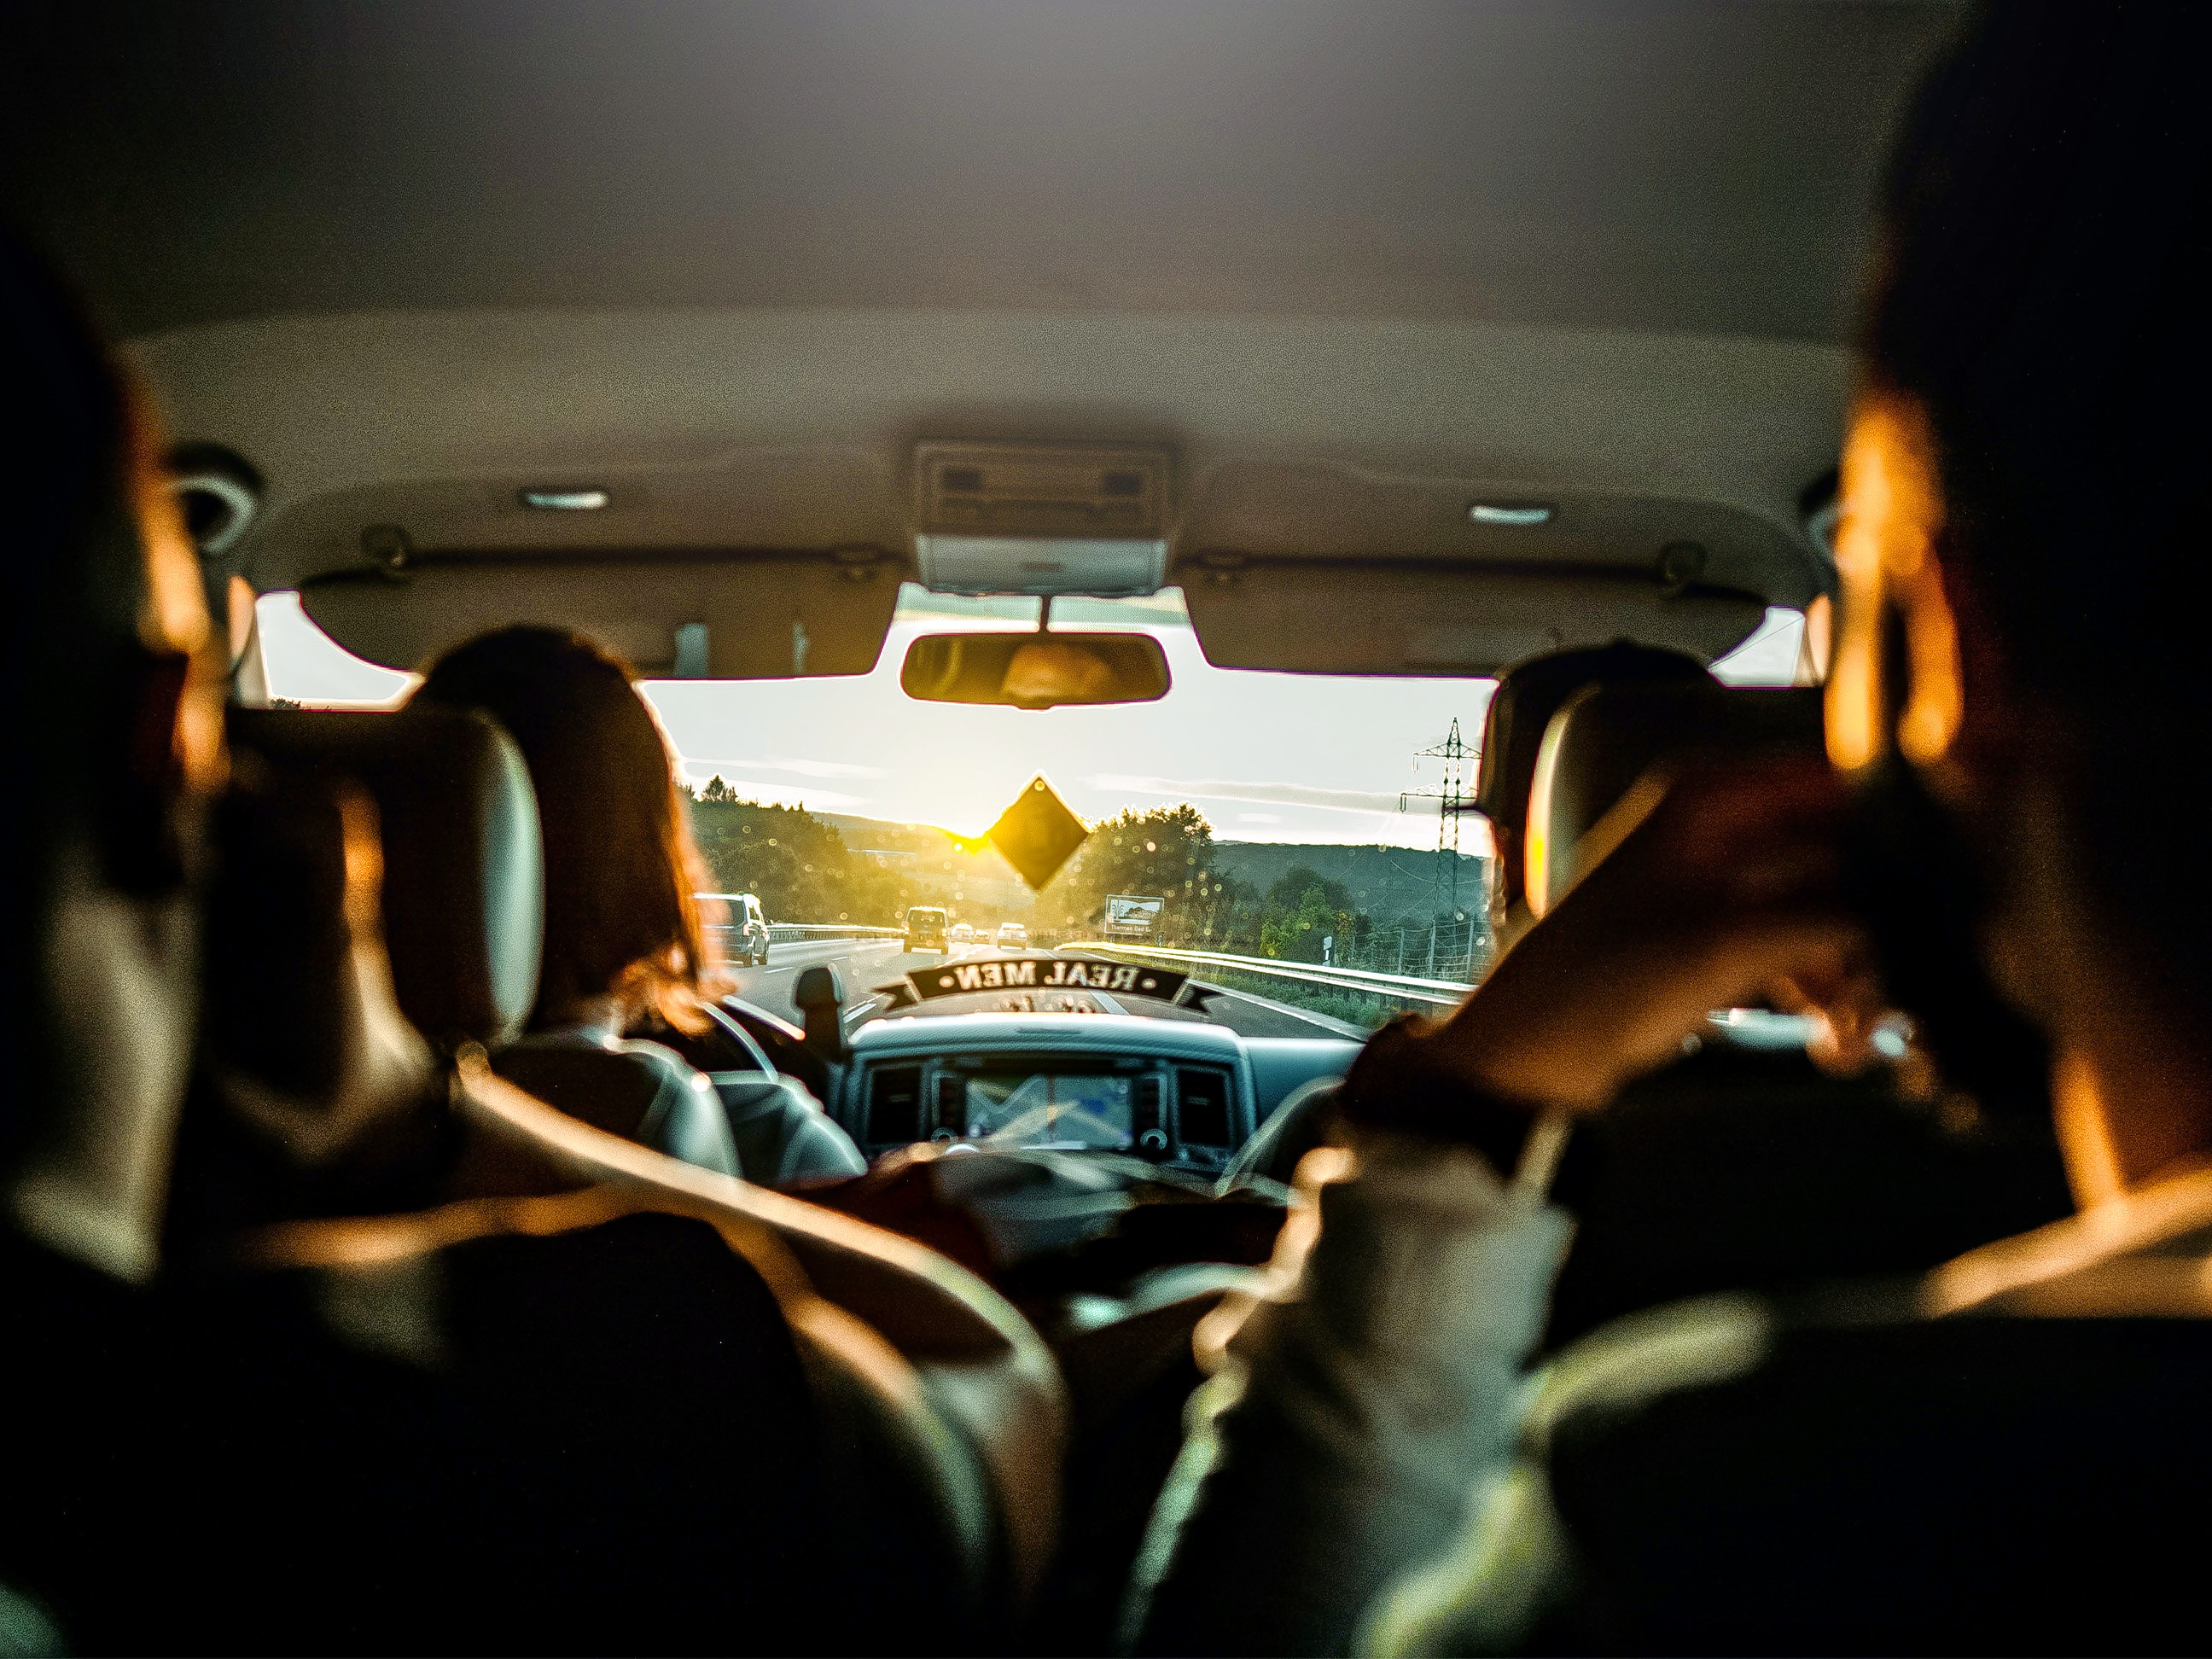 1586865942_people-inside-a-vehicle-3543856.jpg